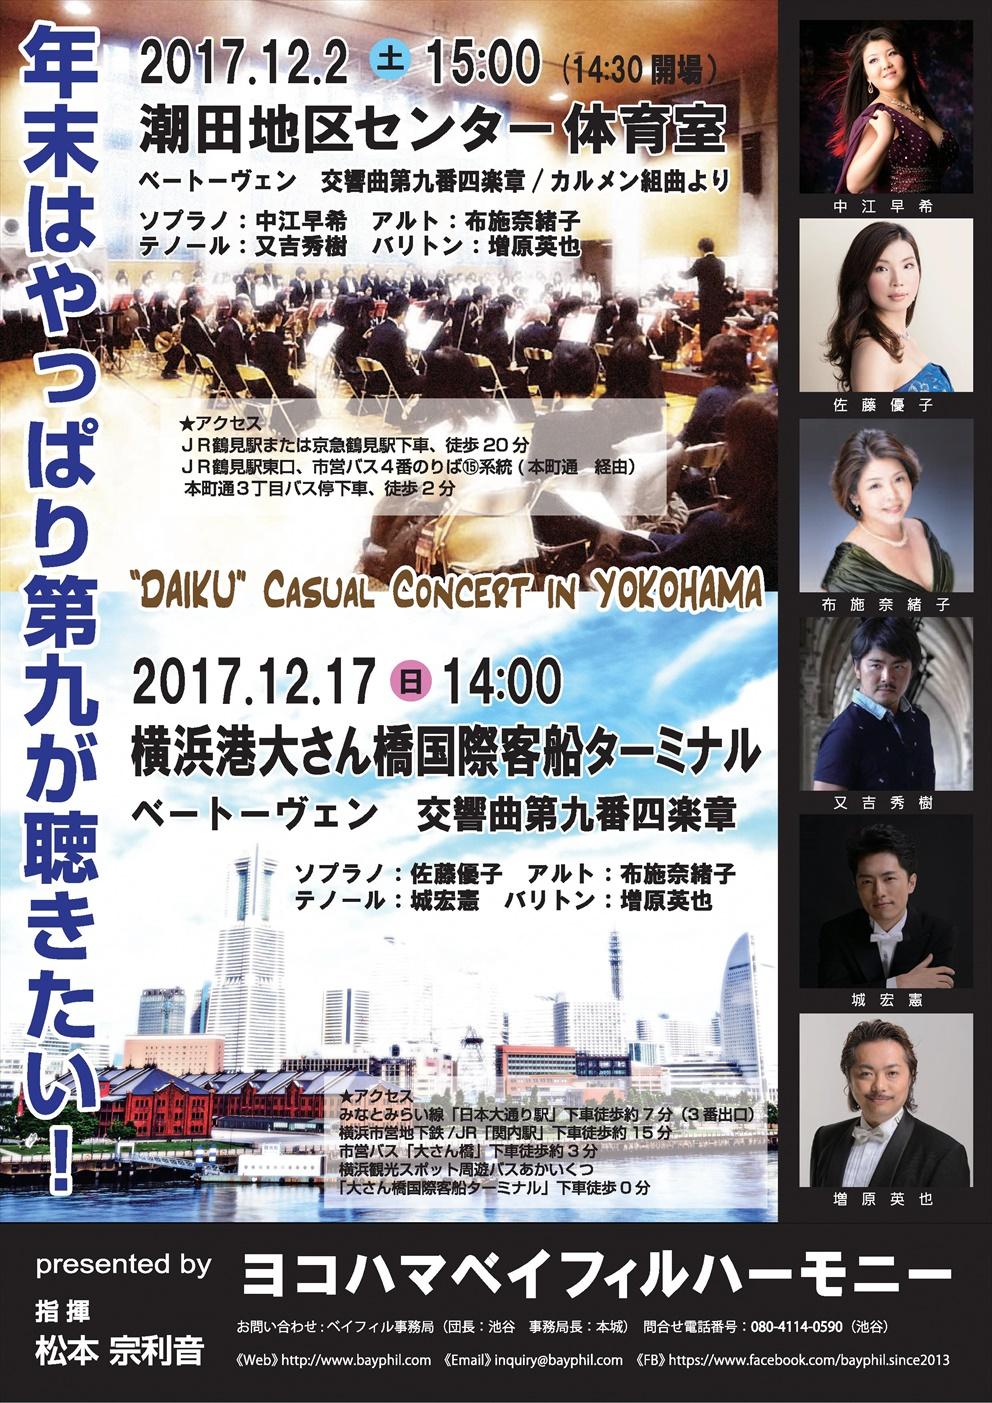 https://yokooto.jp/wp-content/uploads/2017/11/ヨコハマベイフィルチラシ-1re.jpg